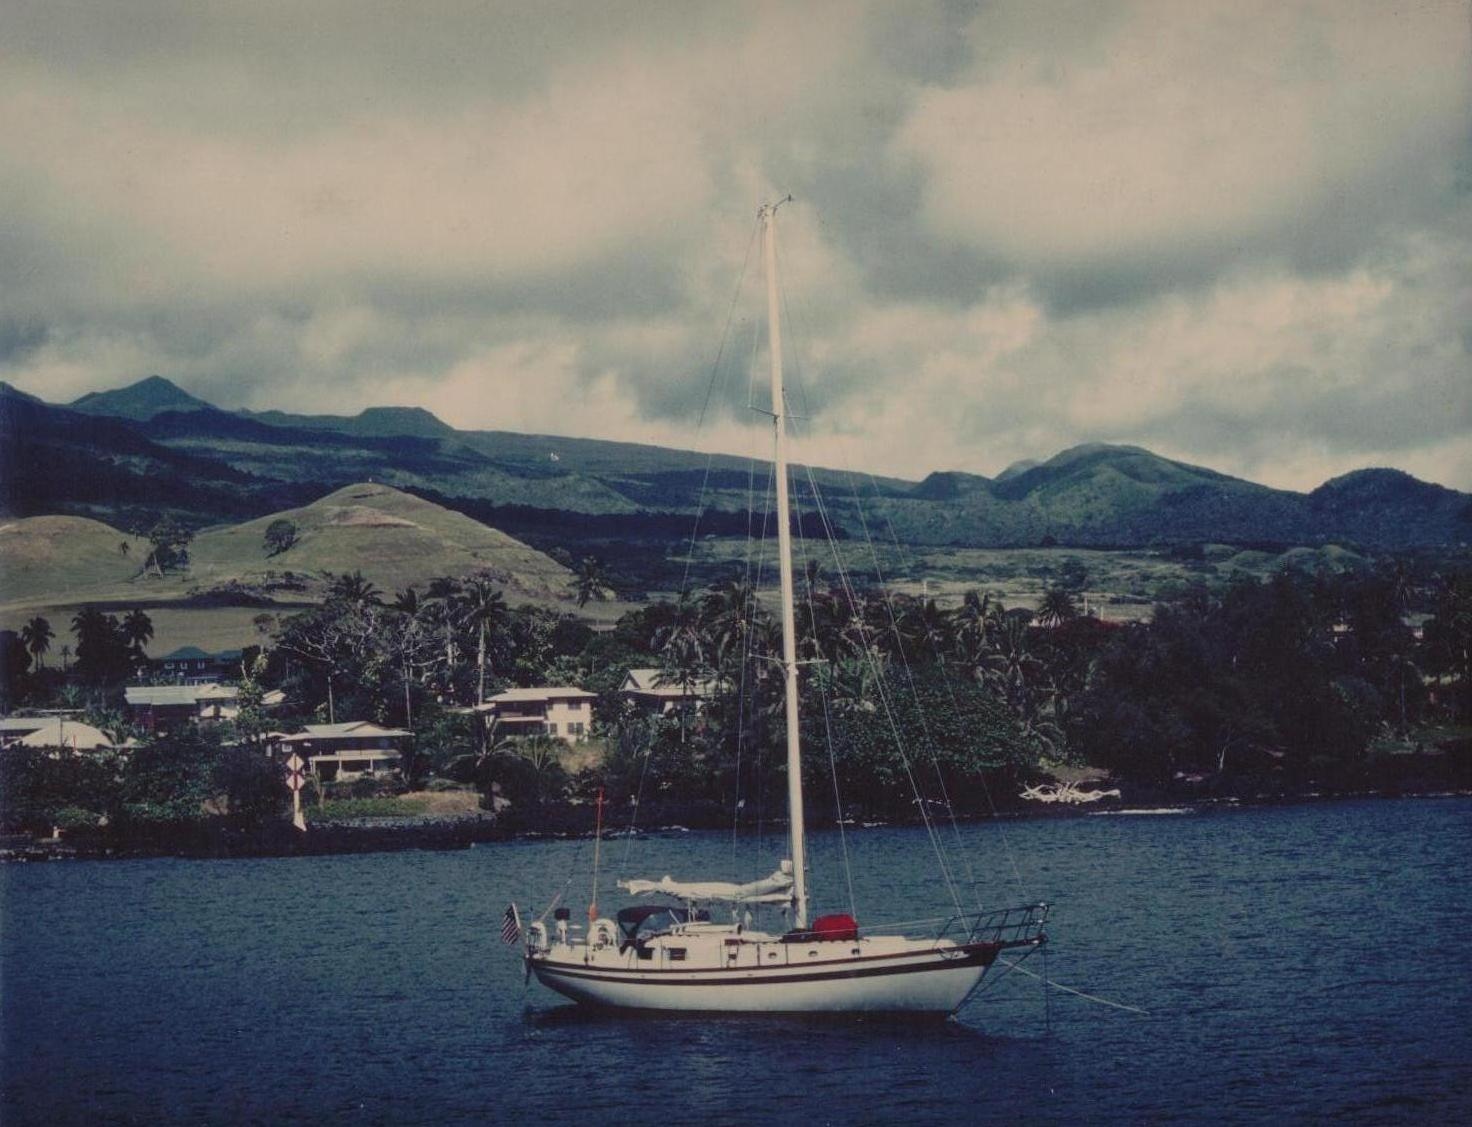 Click image for larger version  Name:Maluhia in Hana Bay, July 1979.jpg Views:255 Size:173.5 KB ID:8352